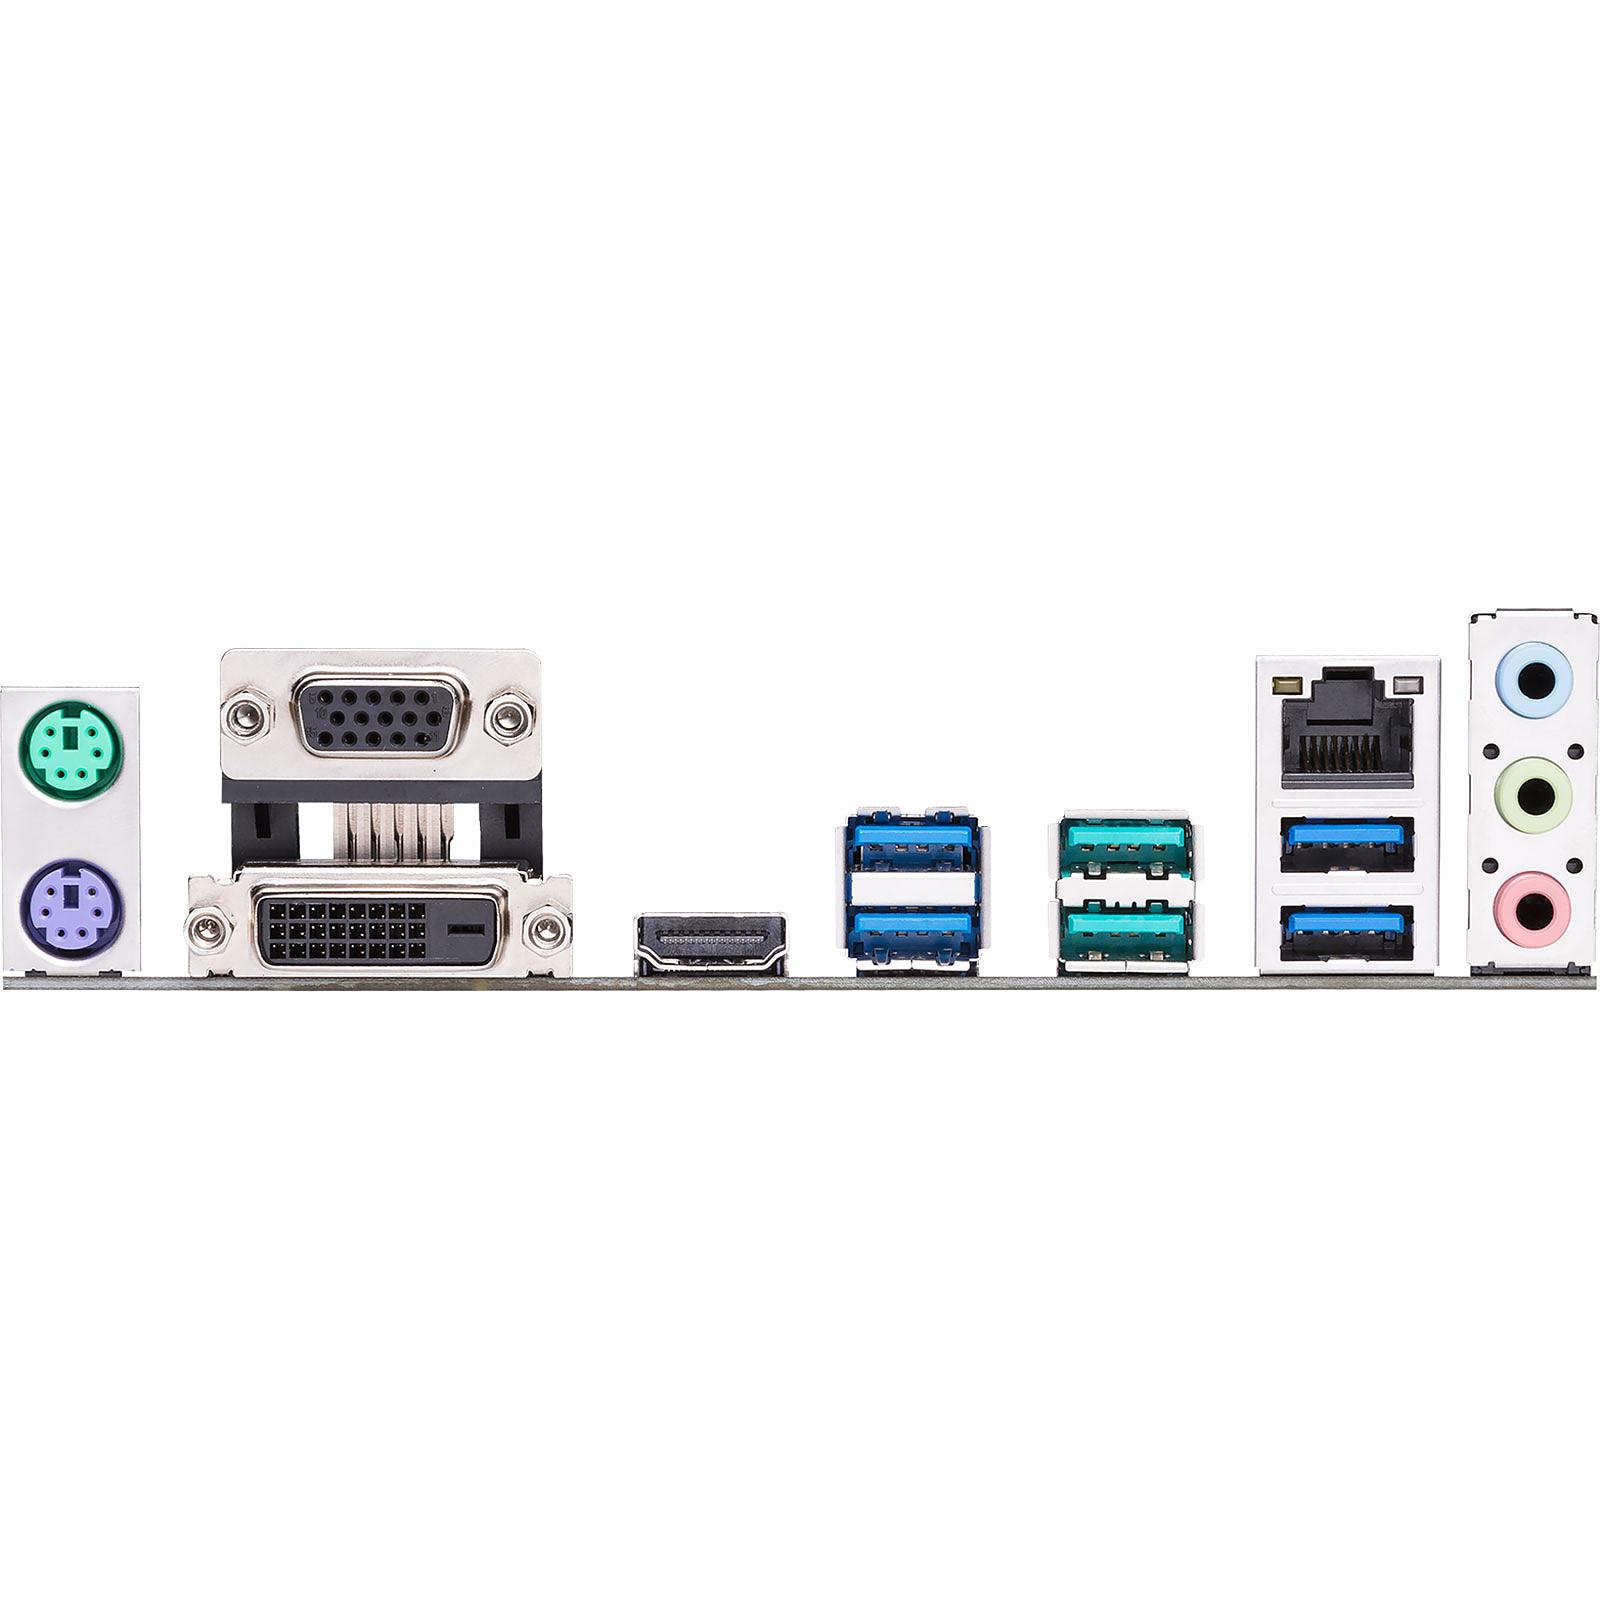 Asus PRIME B450M-A Micro-ATX DDR4 - Carte mère Asus - Cybertek.fr - 1